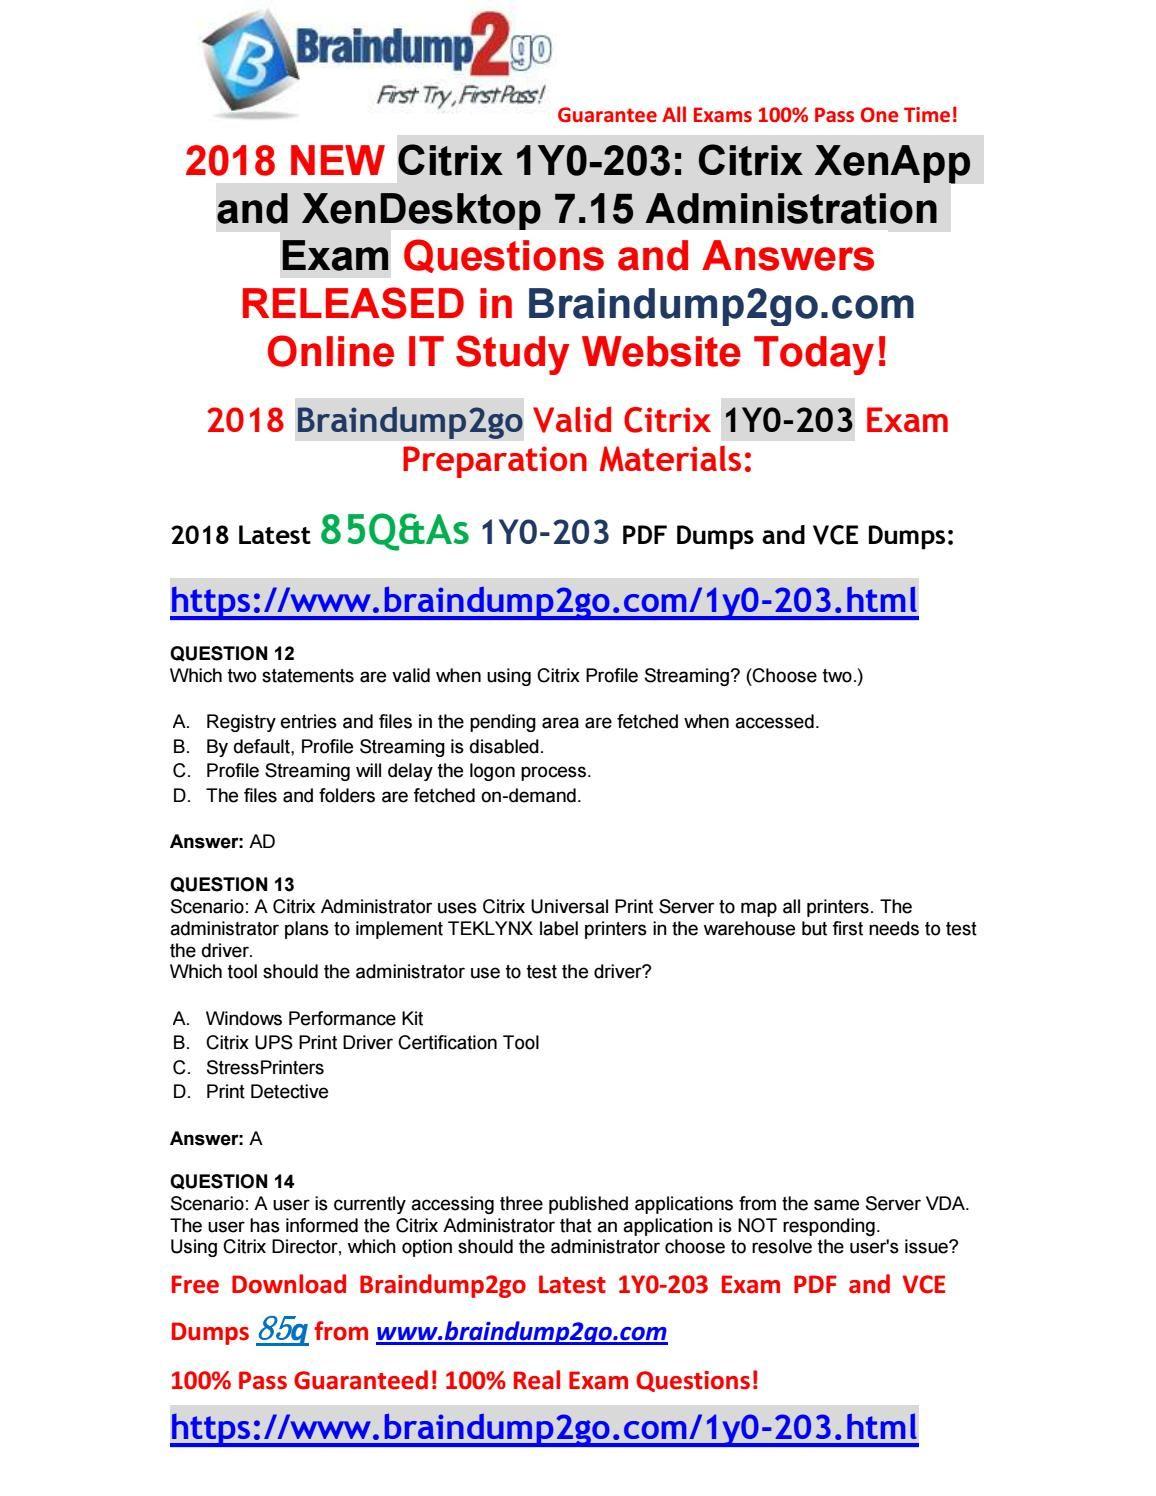 Feb-2018] Braindump2go New 1Y0-203 Dumps with PDF and VCE 85Q&As